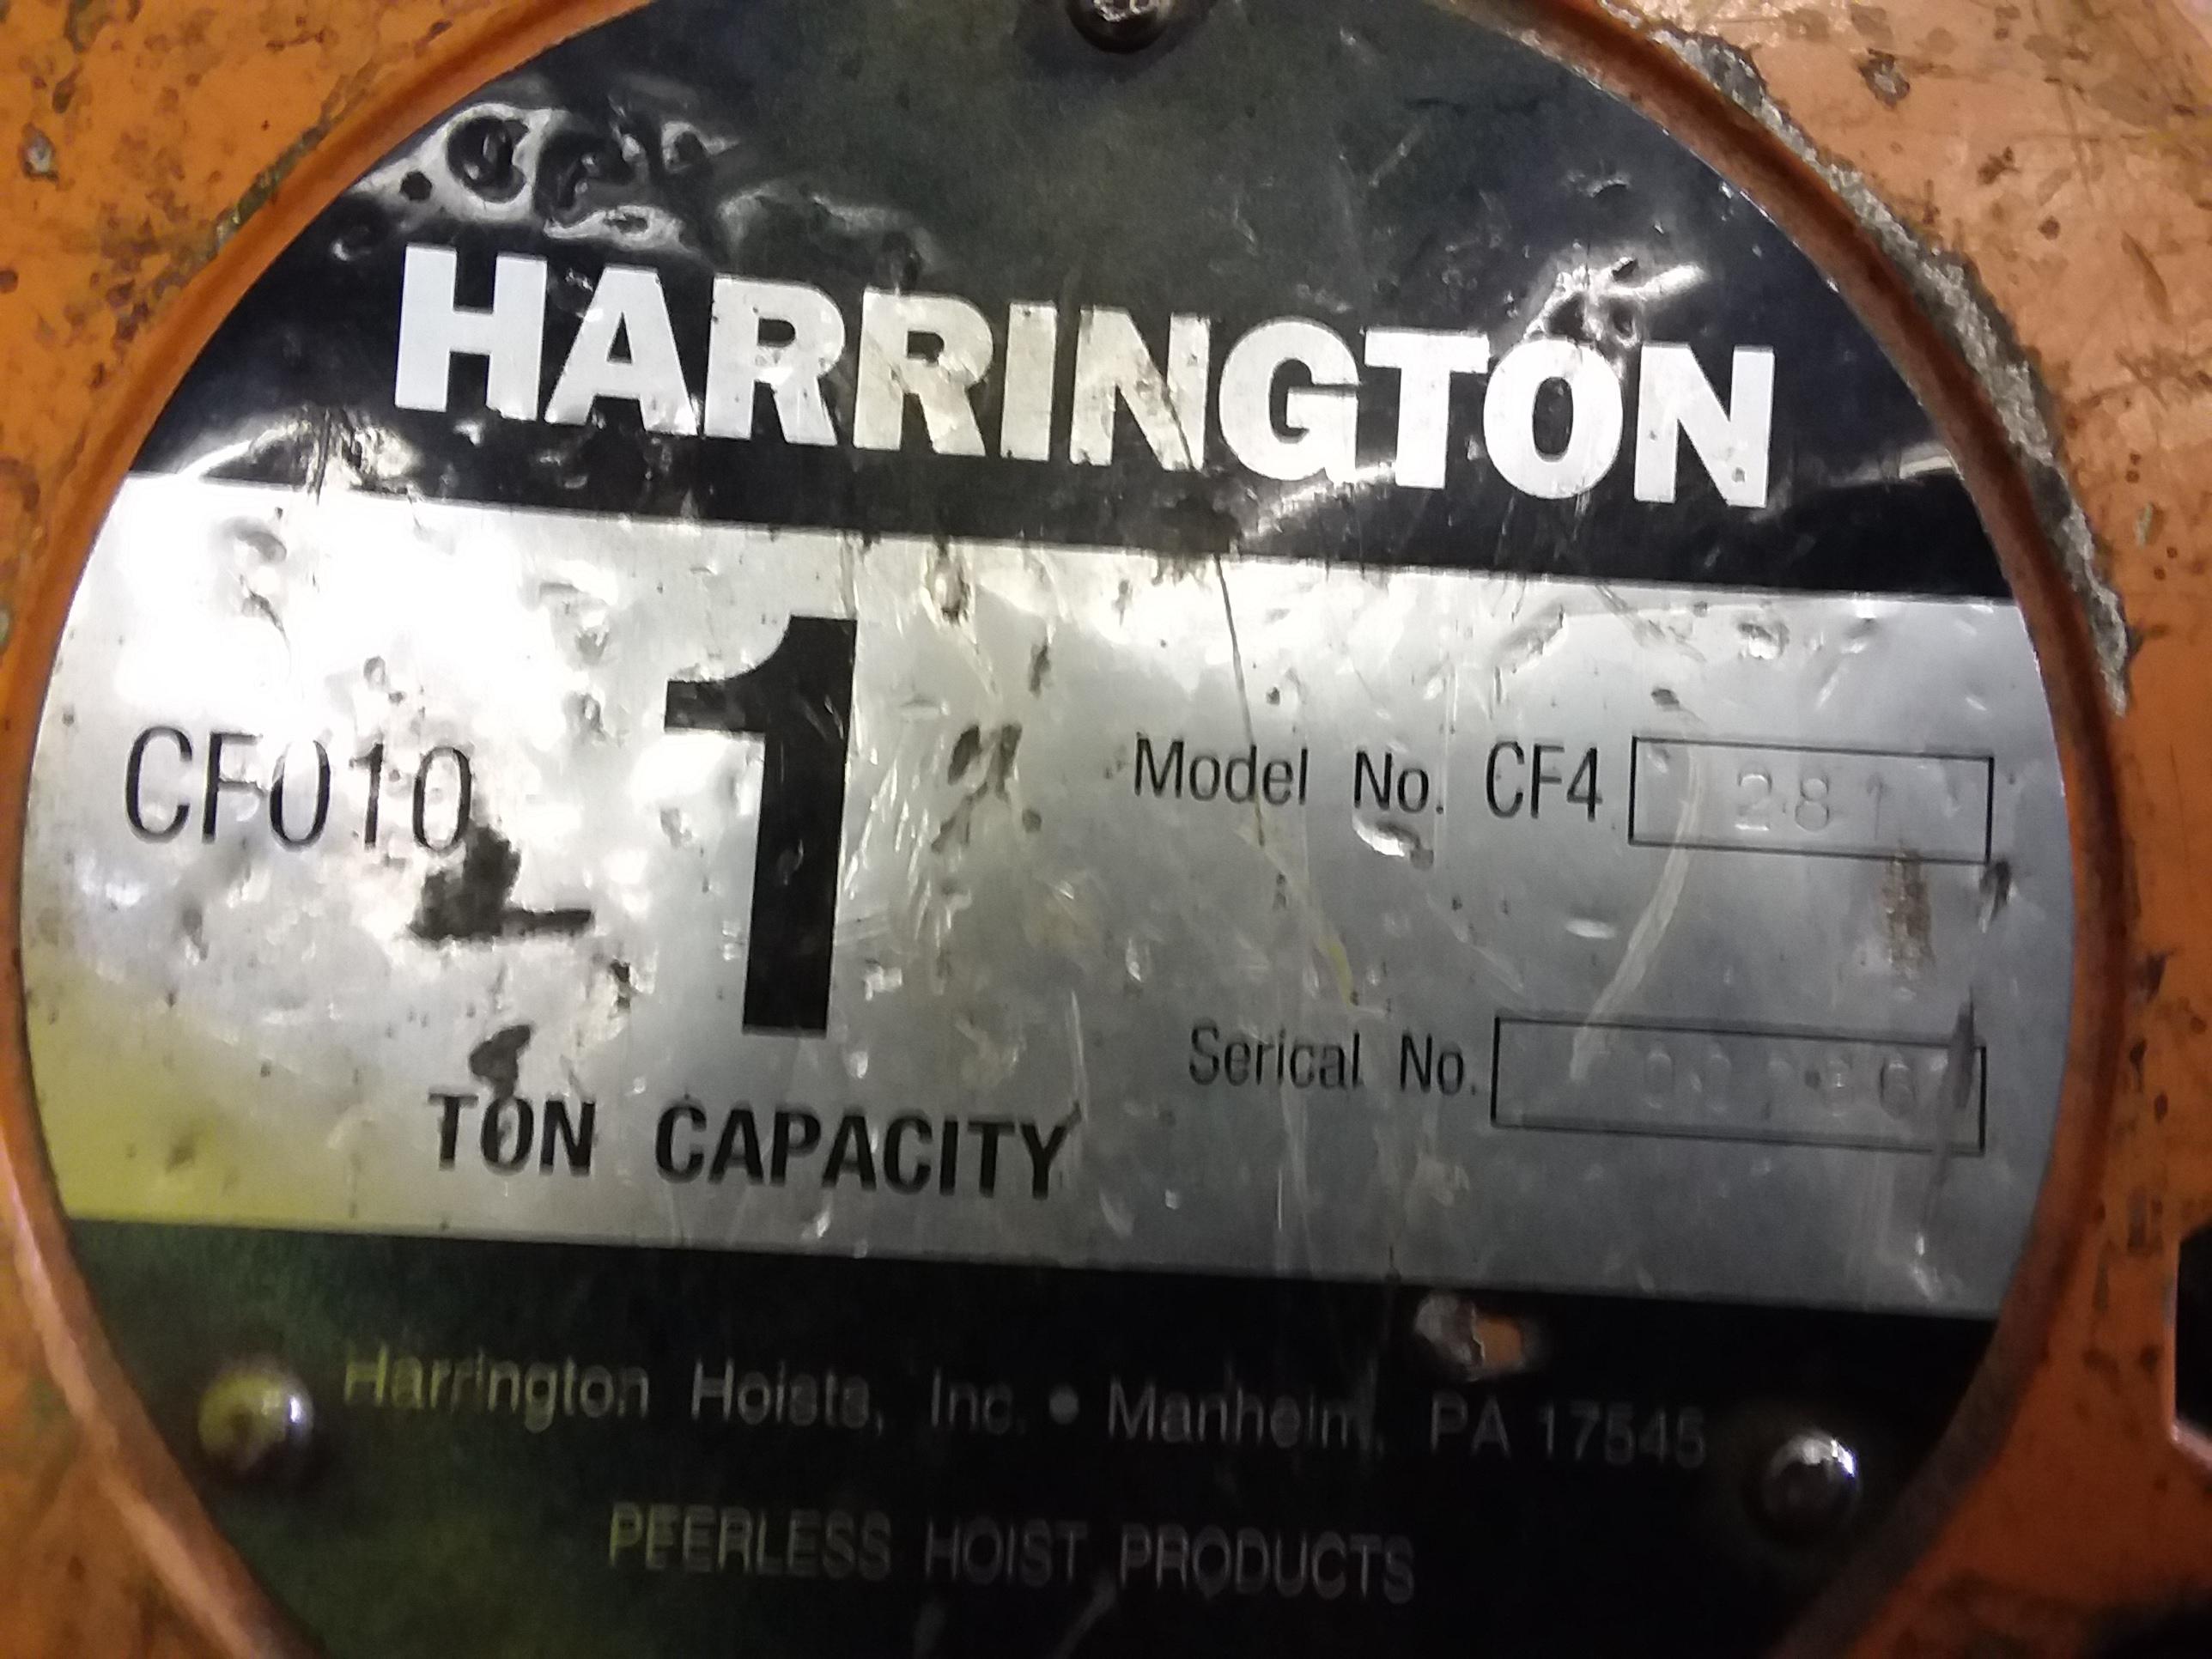 (1) PREOWNED HARRINGTON 1 TON CHAIN HOIST, MODEL CF4-281,<br>S/N 700286